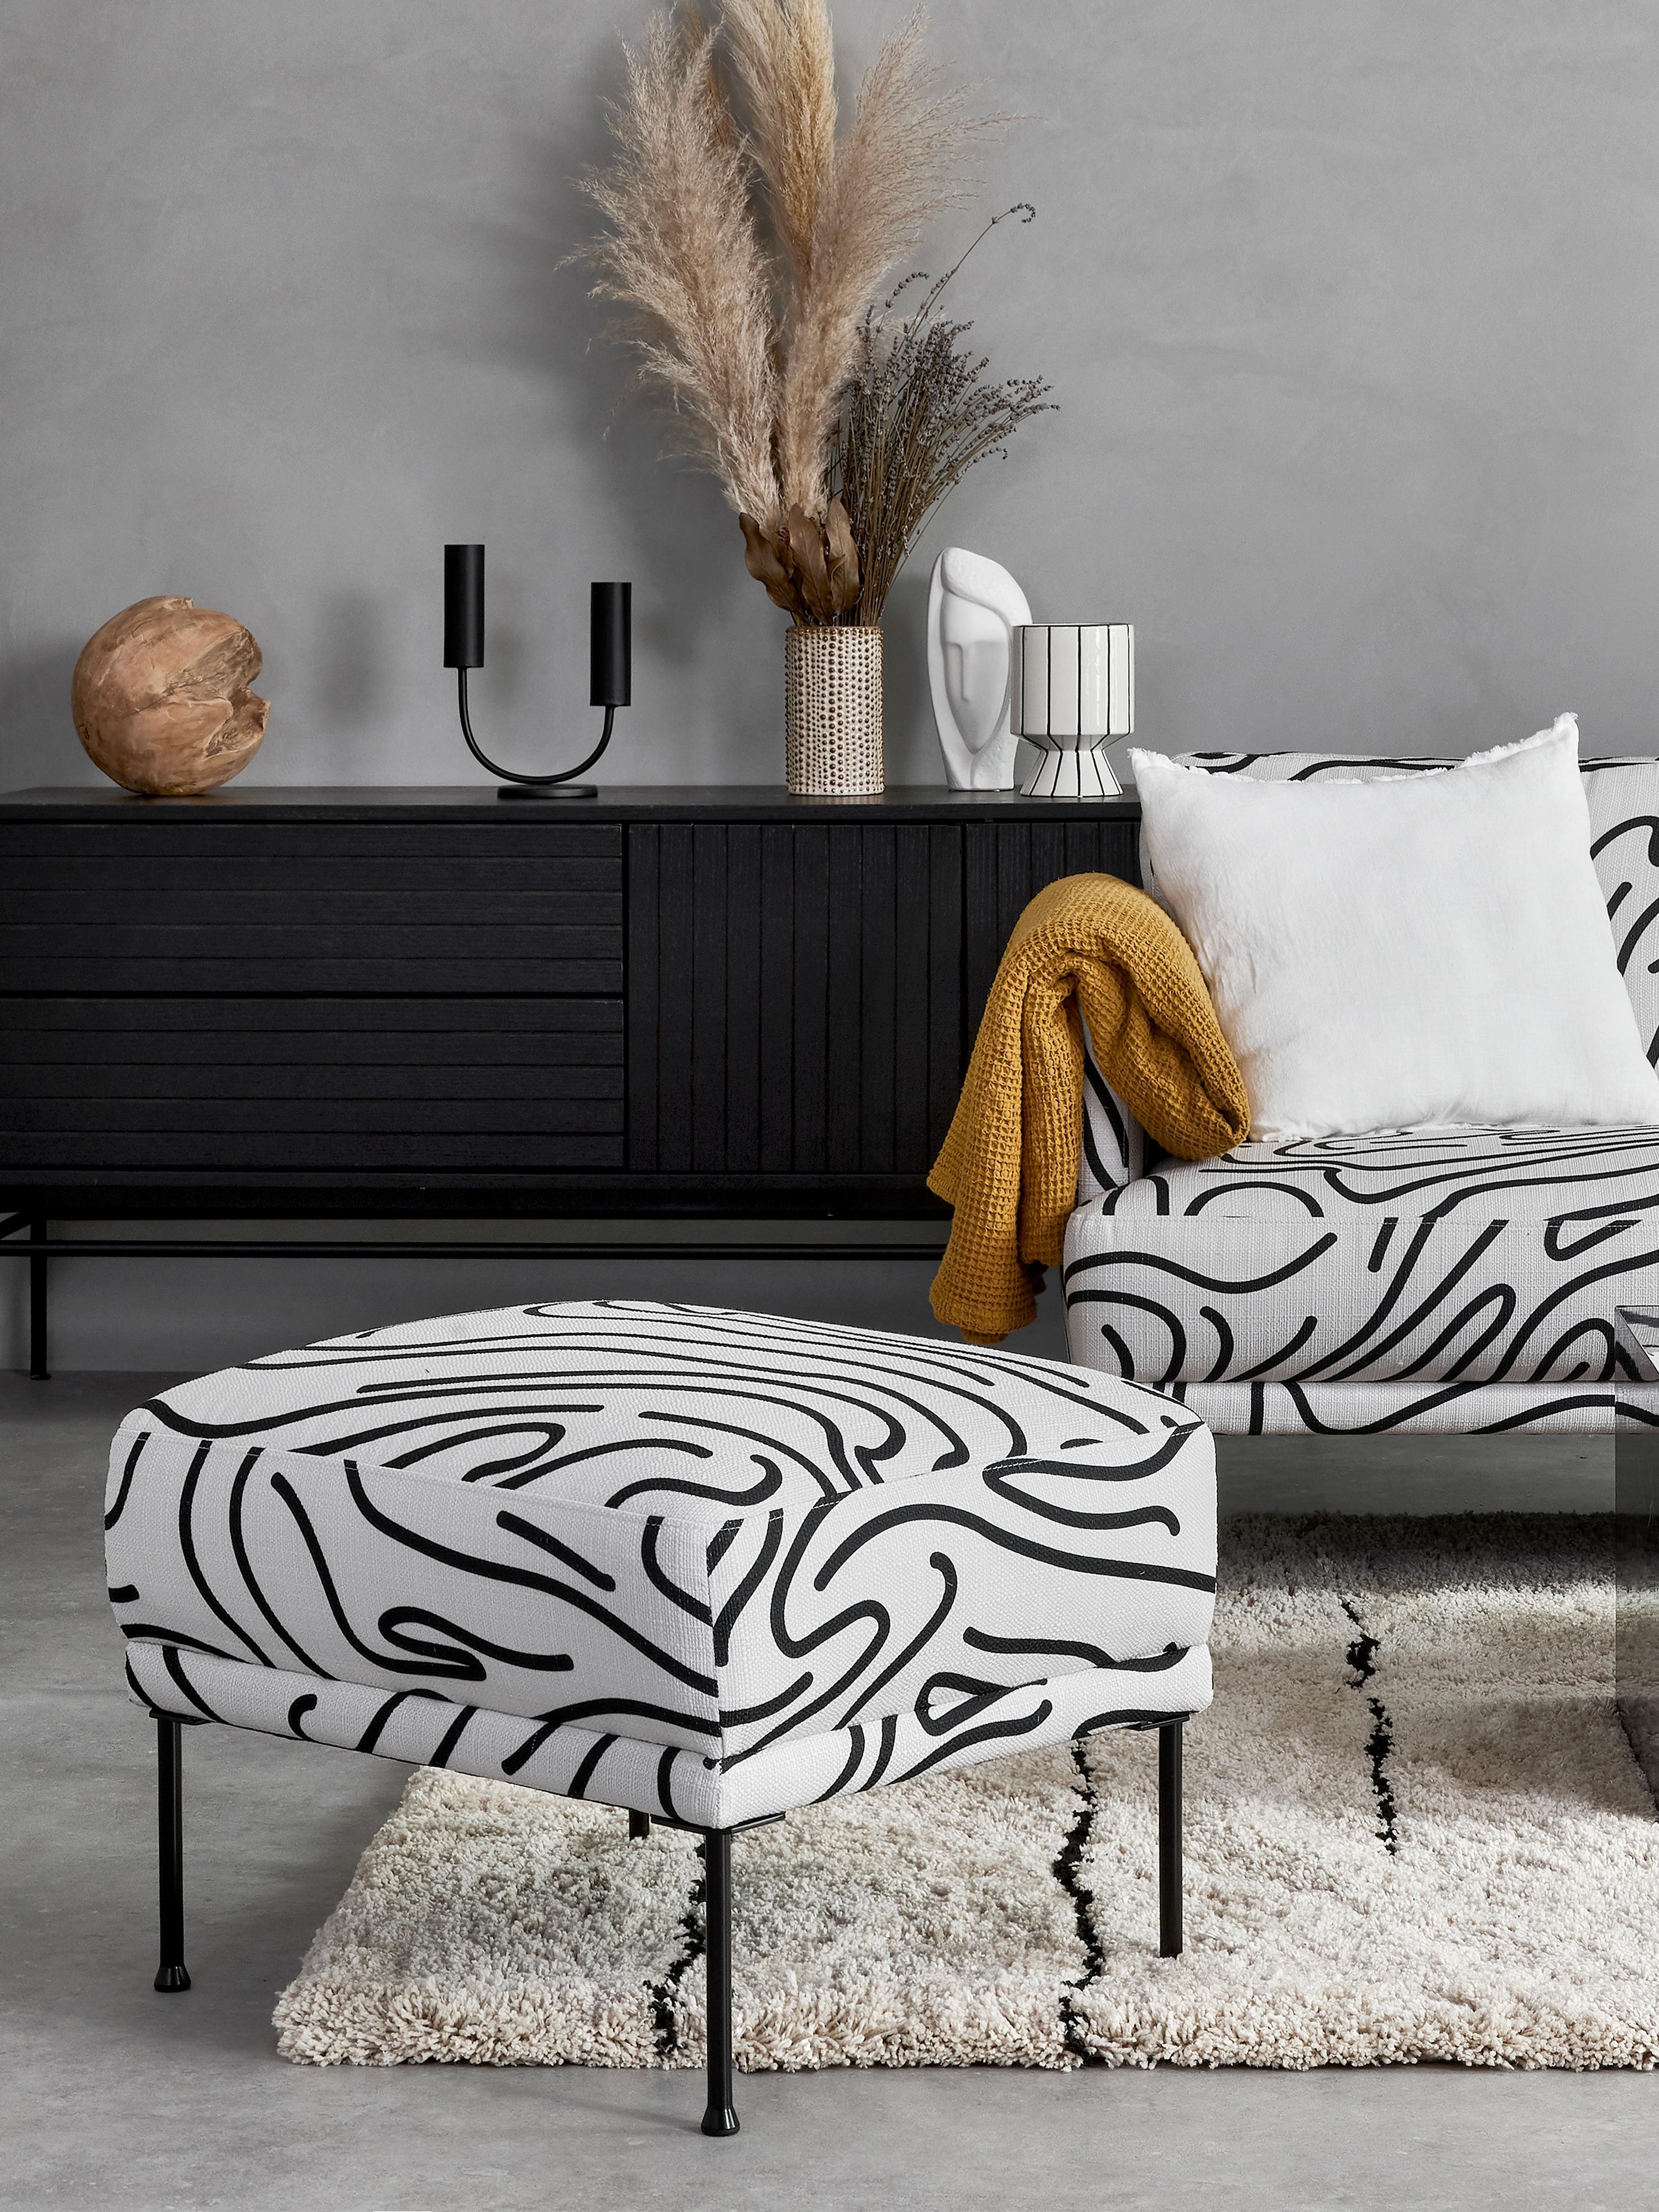 Sofa-Hocker Fluente, Bezug: 100% Polyester Der hochwe, Gestell: Massives Kiefernholz, Webstoff Weiss, 62 x 46 cm